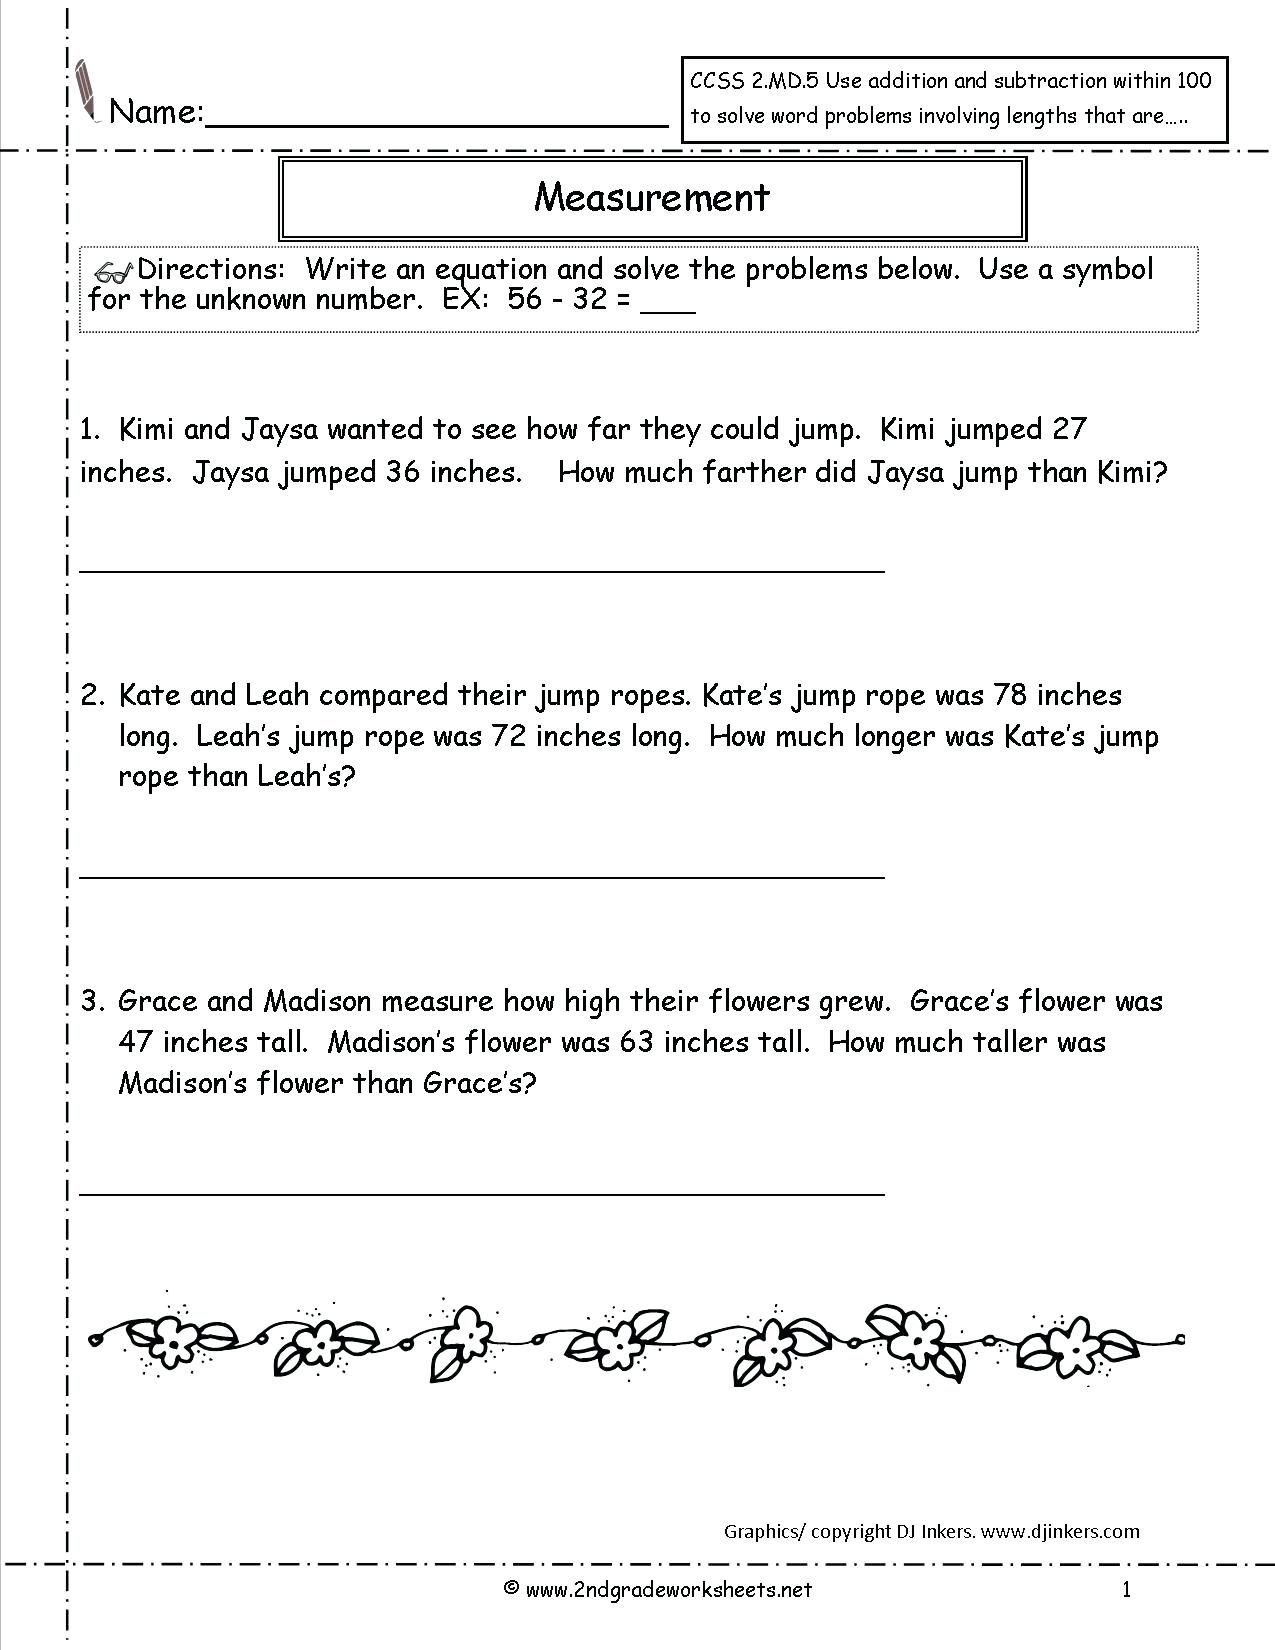 1st Grade Measurement Worksheets Math Worksheet For Kids In 2020 Math Word Problems Subtraction Word Problems Word Problem Worksheets